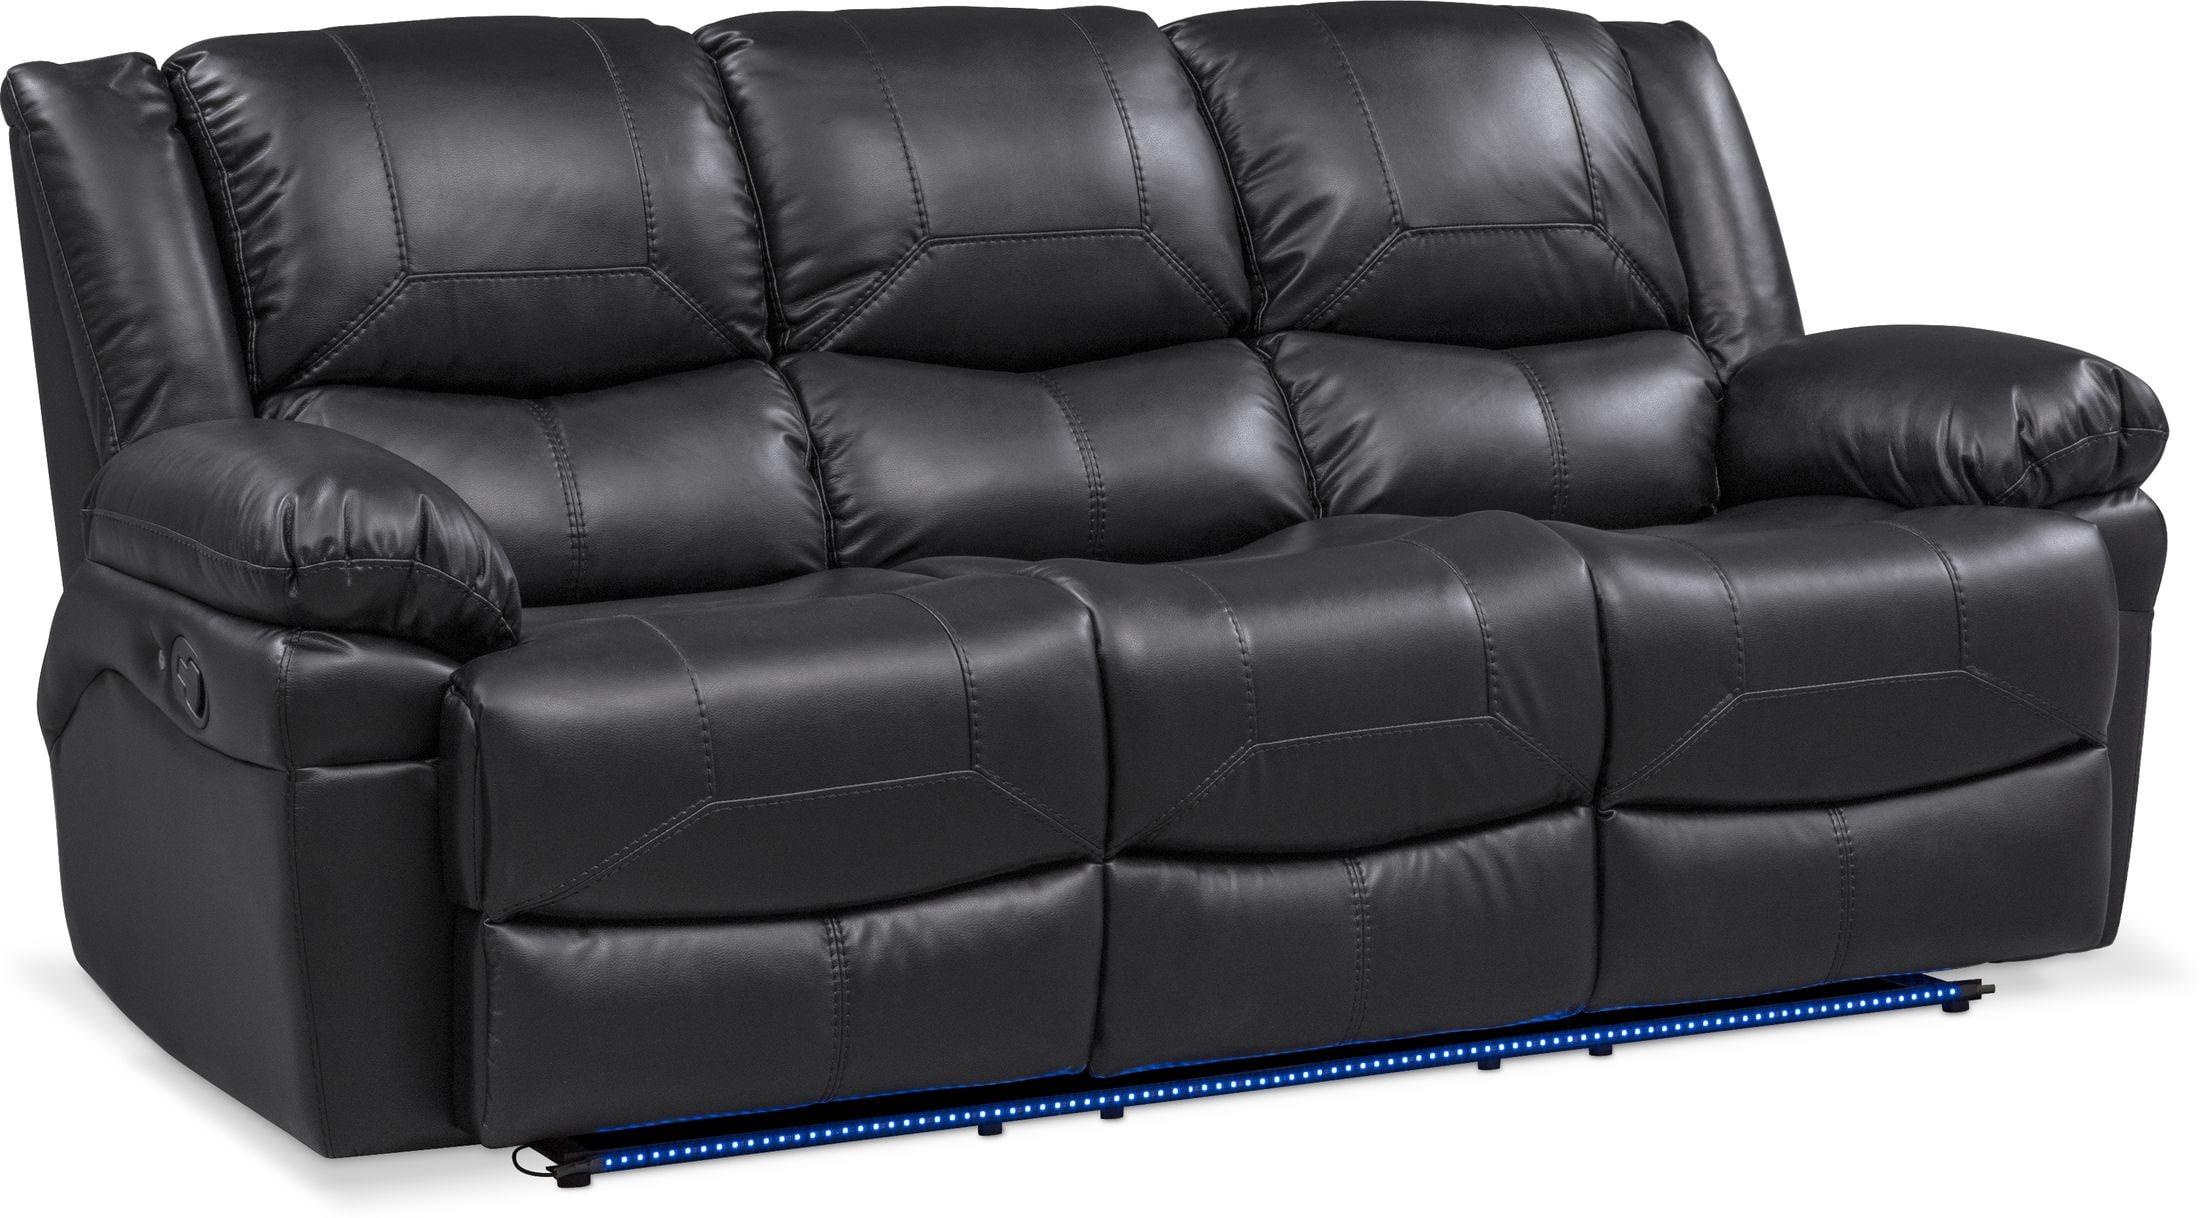 Living Room Furniture - Monza Manual Reclining Sofa